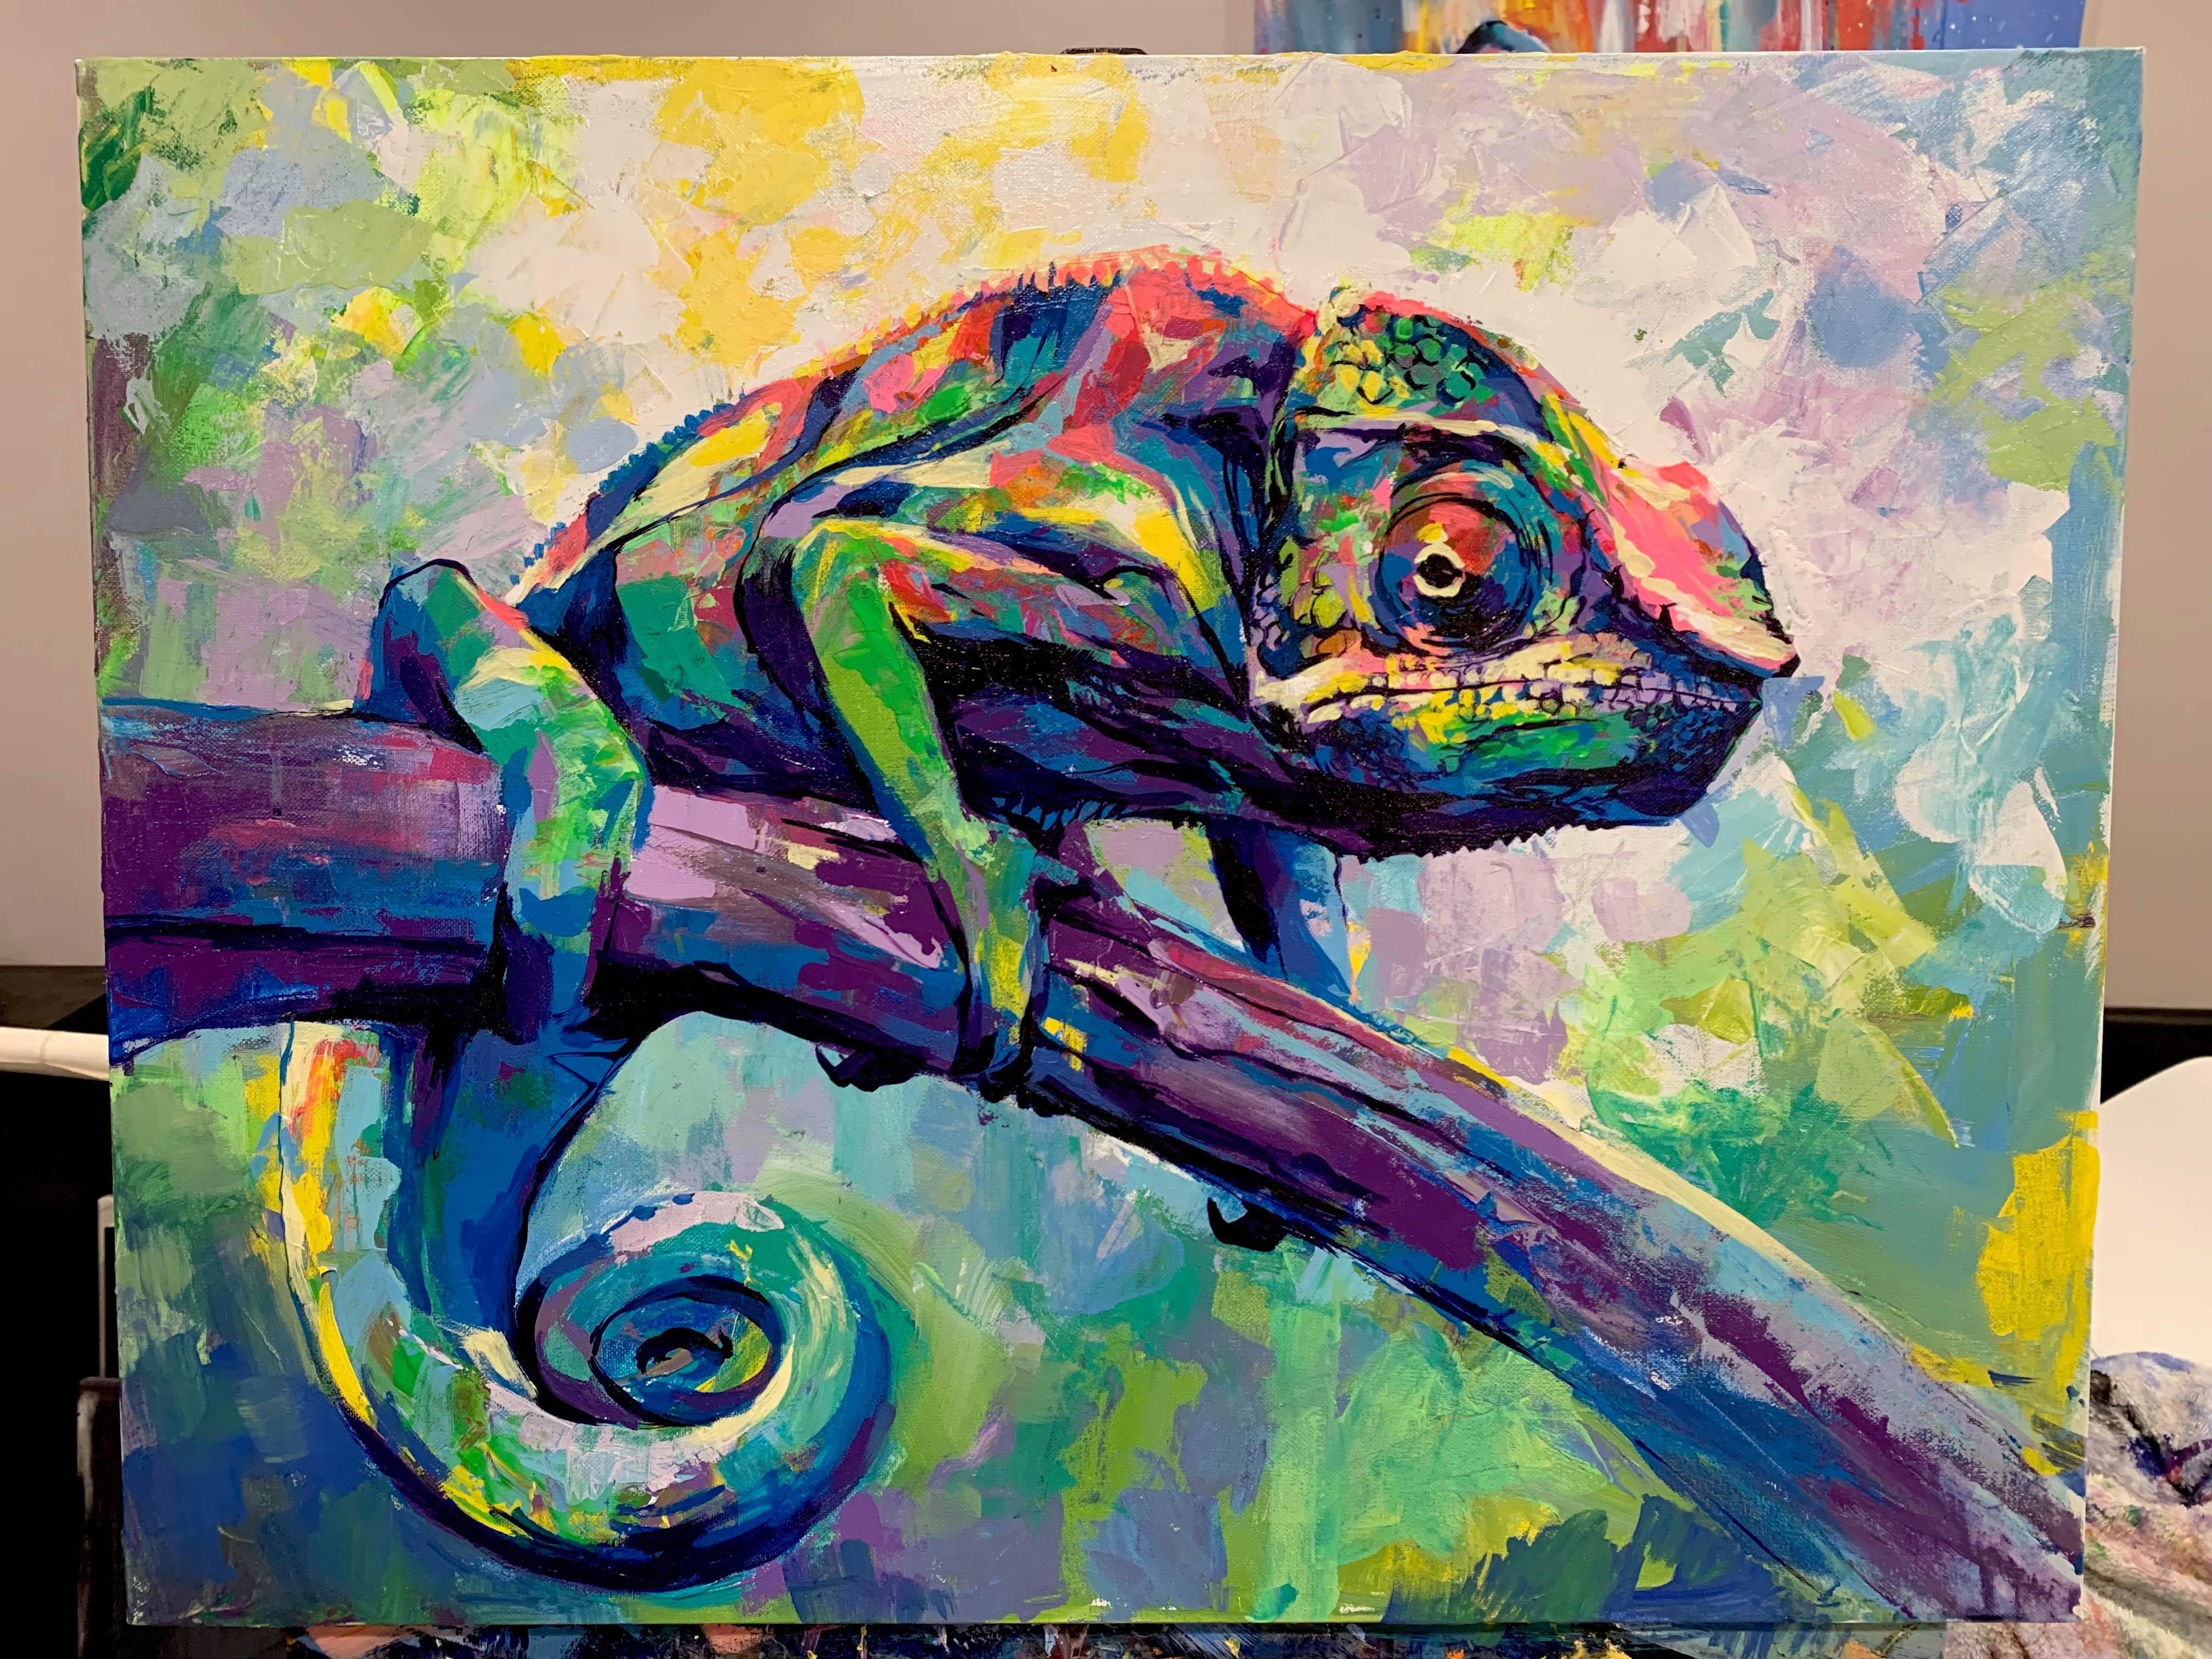 Chameleon Macro Reptile HDP0123 Art Print Poster A4 A3 A2 A1